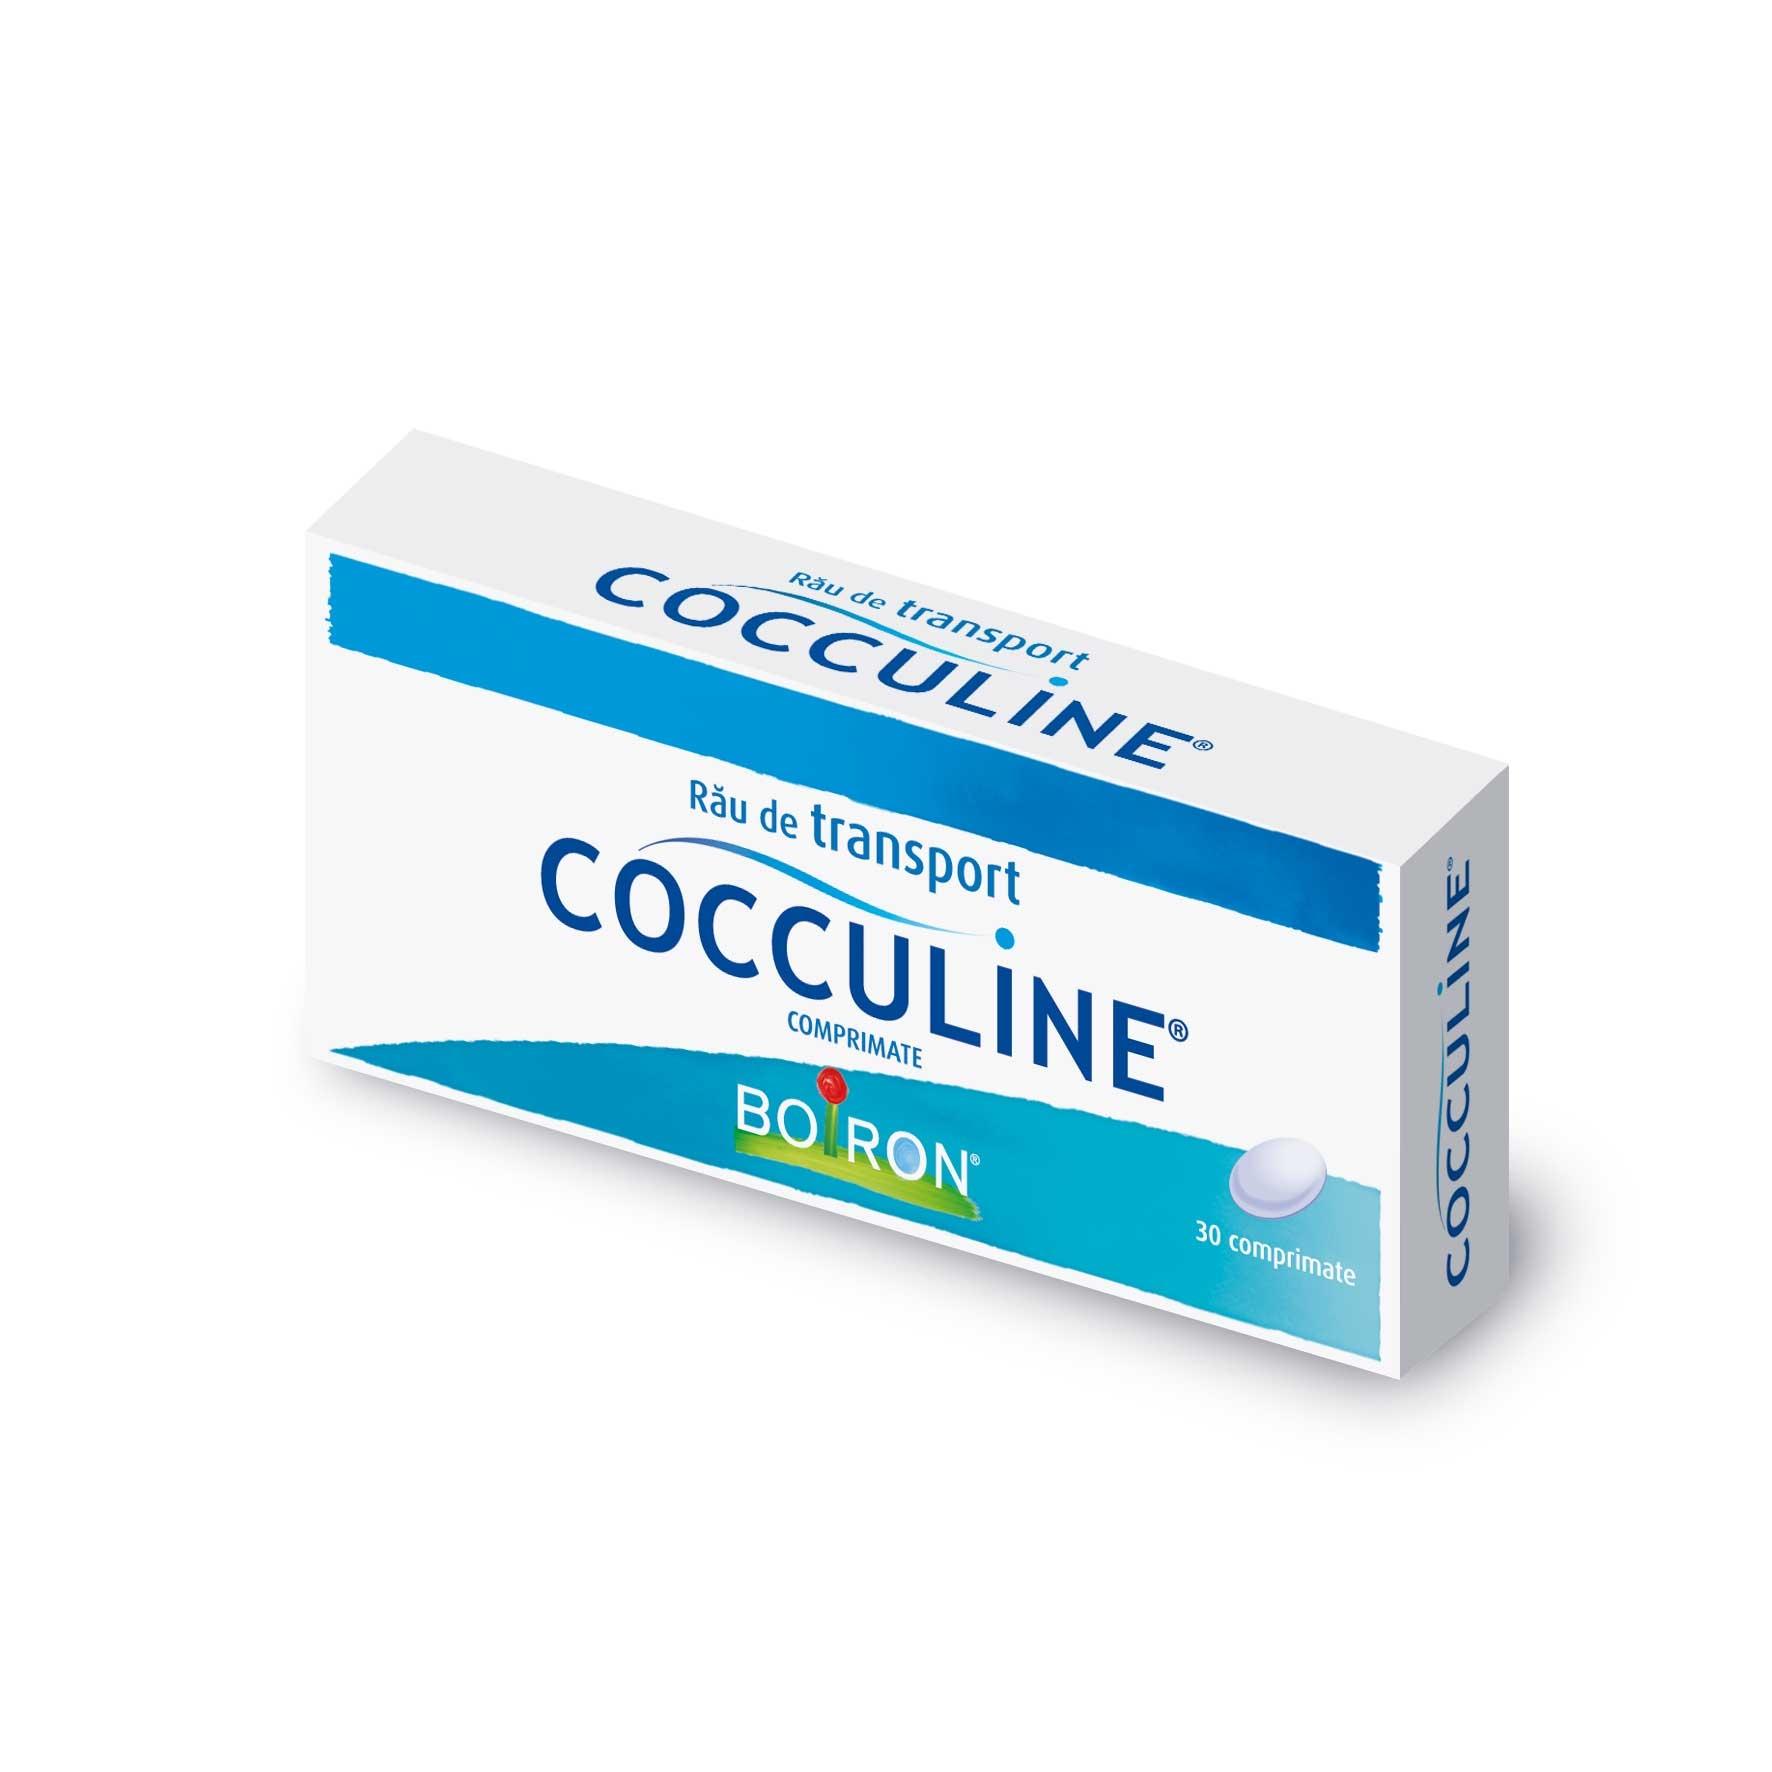 Cuccoline - Boiron